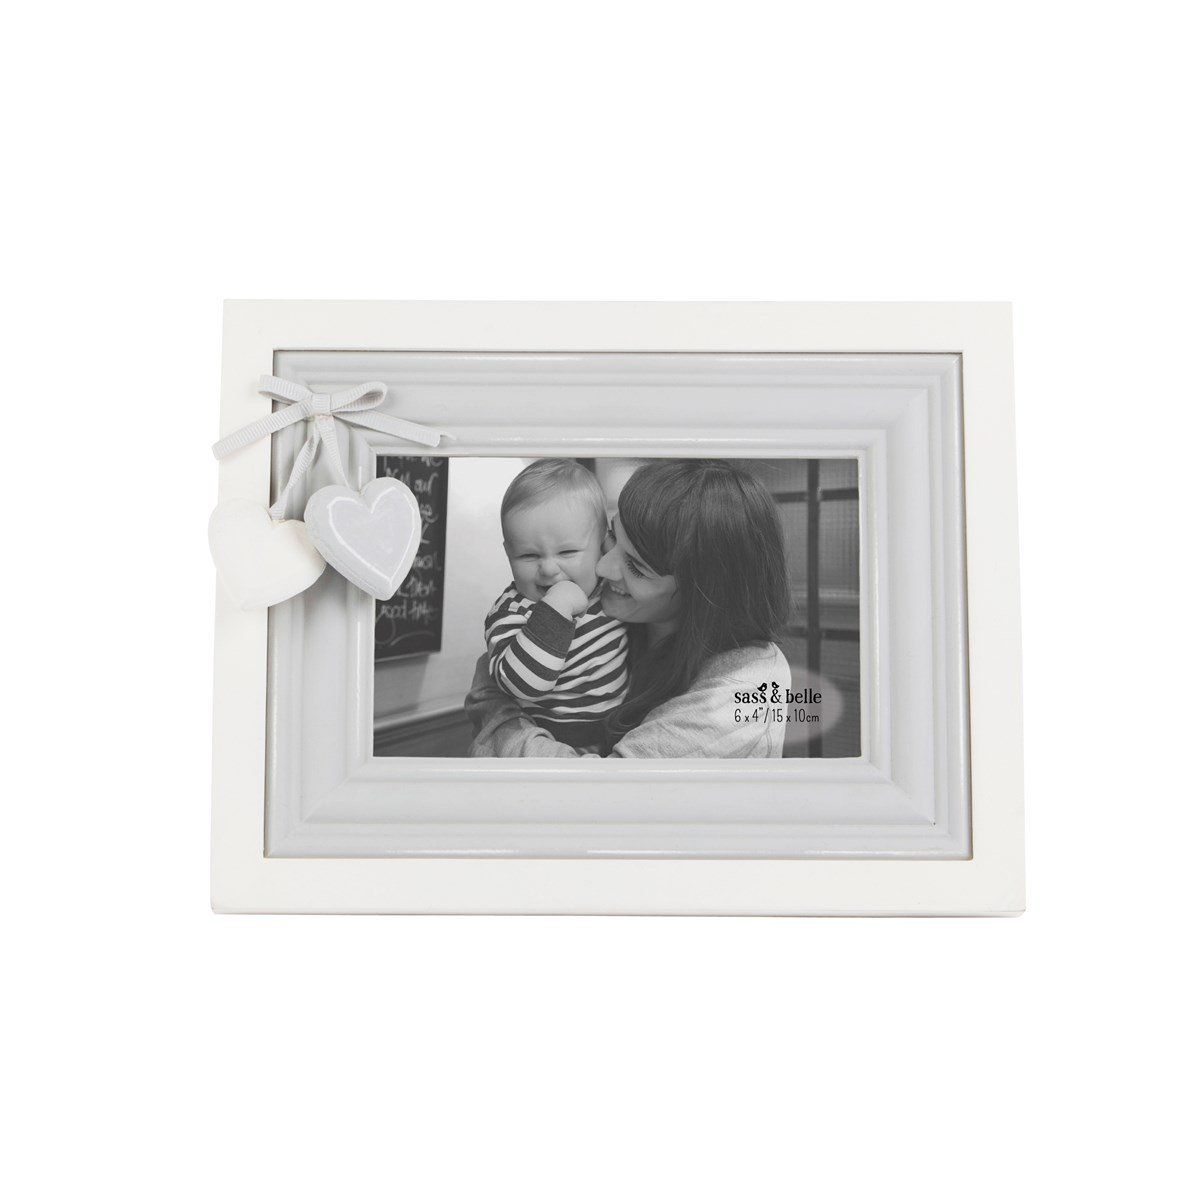 Lealia Photo Frame Ad172 Amazon Co Uk Kitchen Home Photo Frame Photo Picture Frames Frame